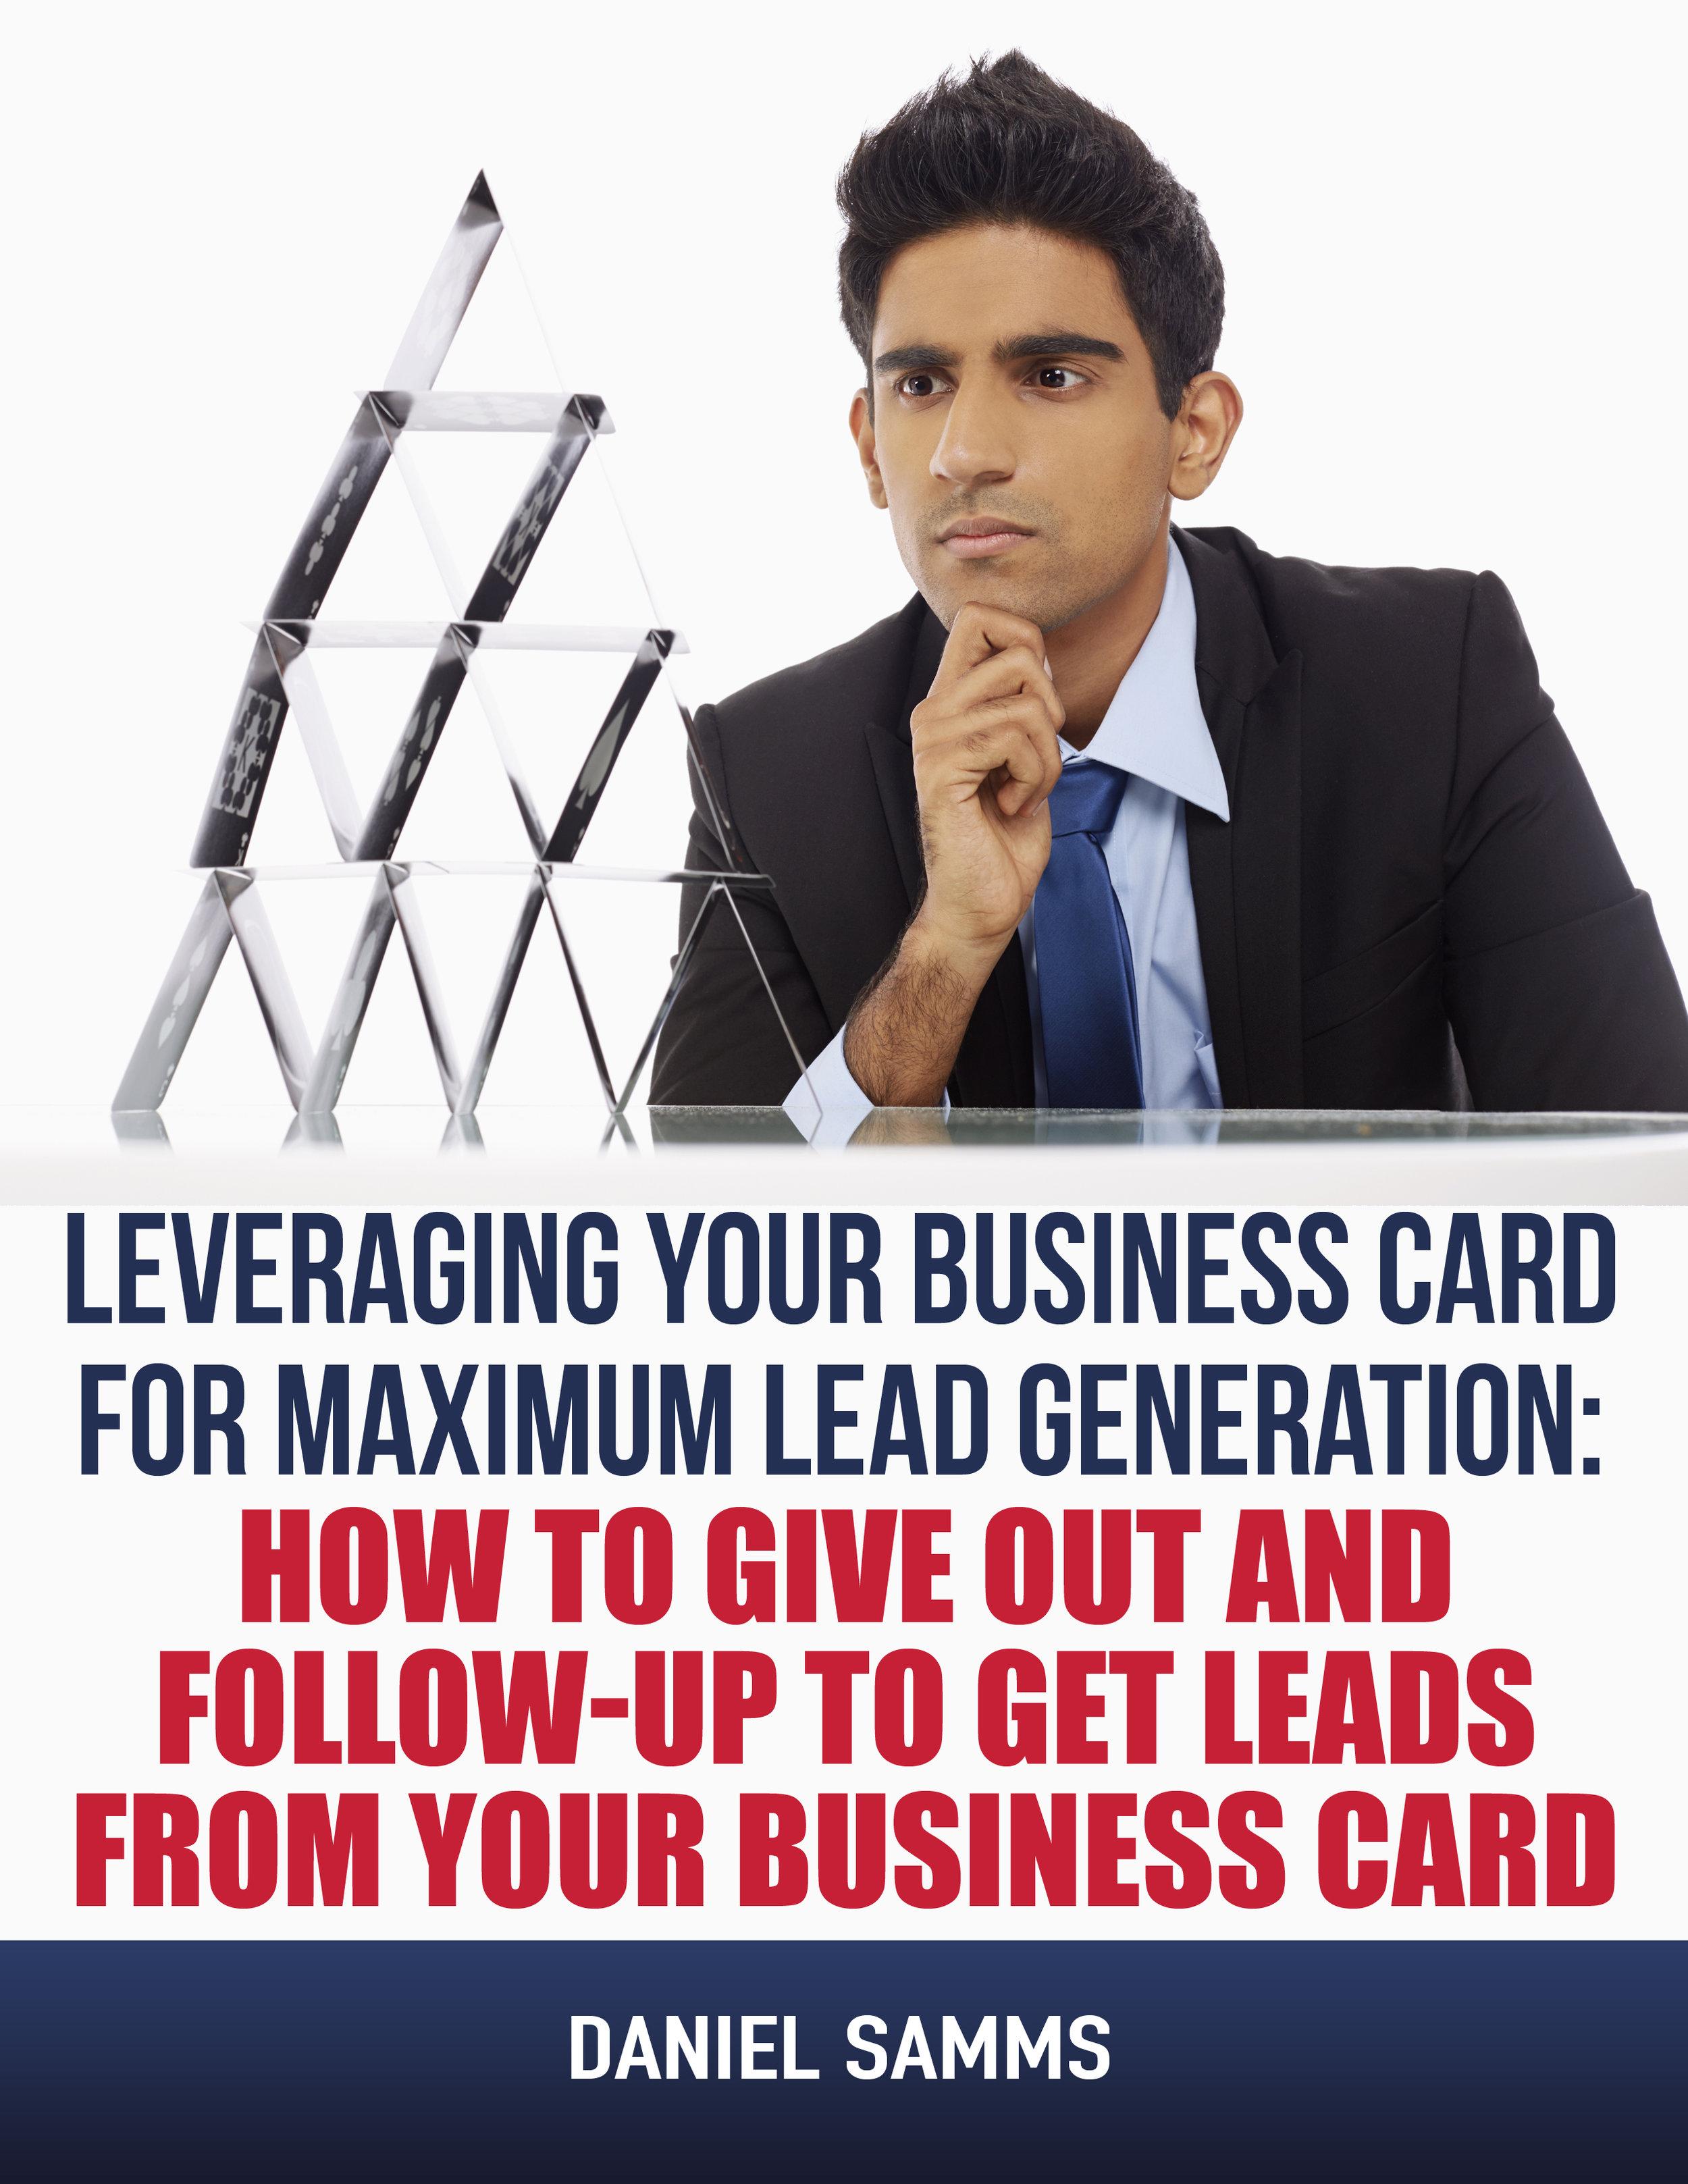 LeveragingYourBusinessCard.jpg